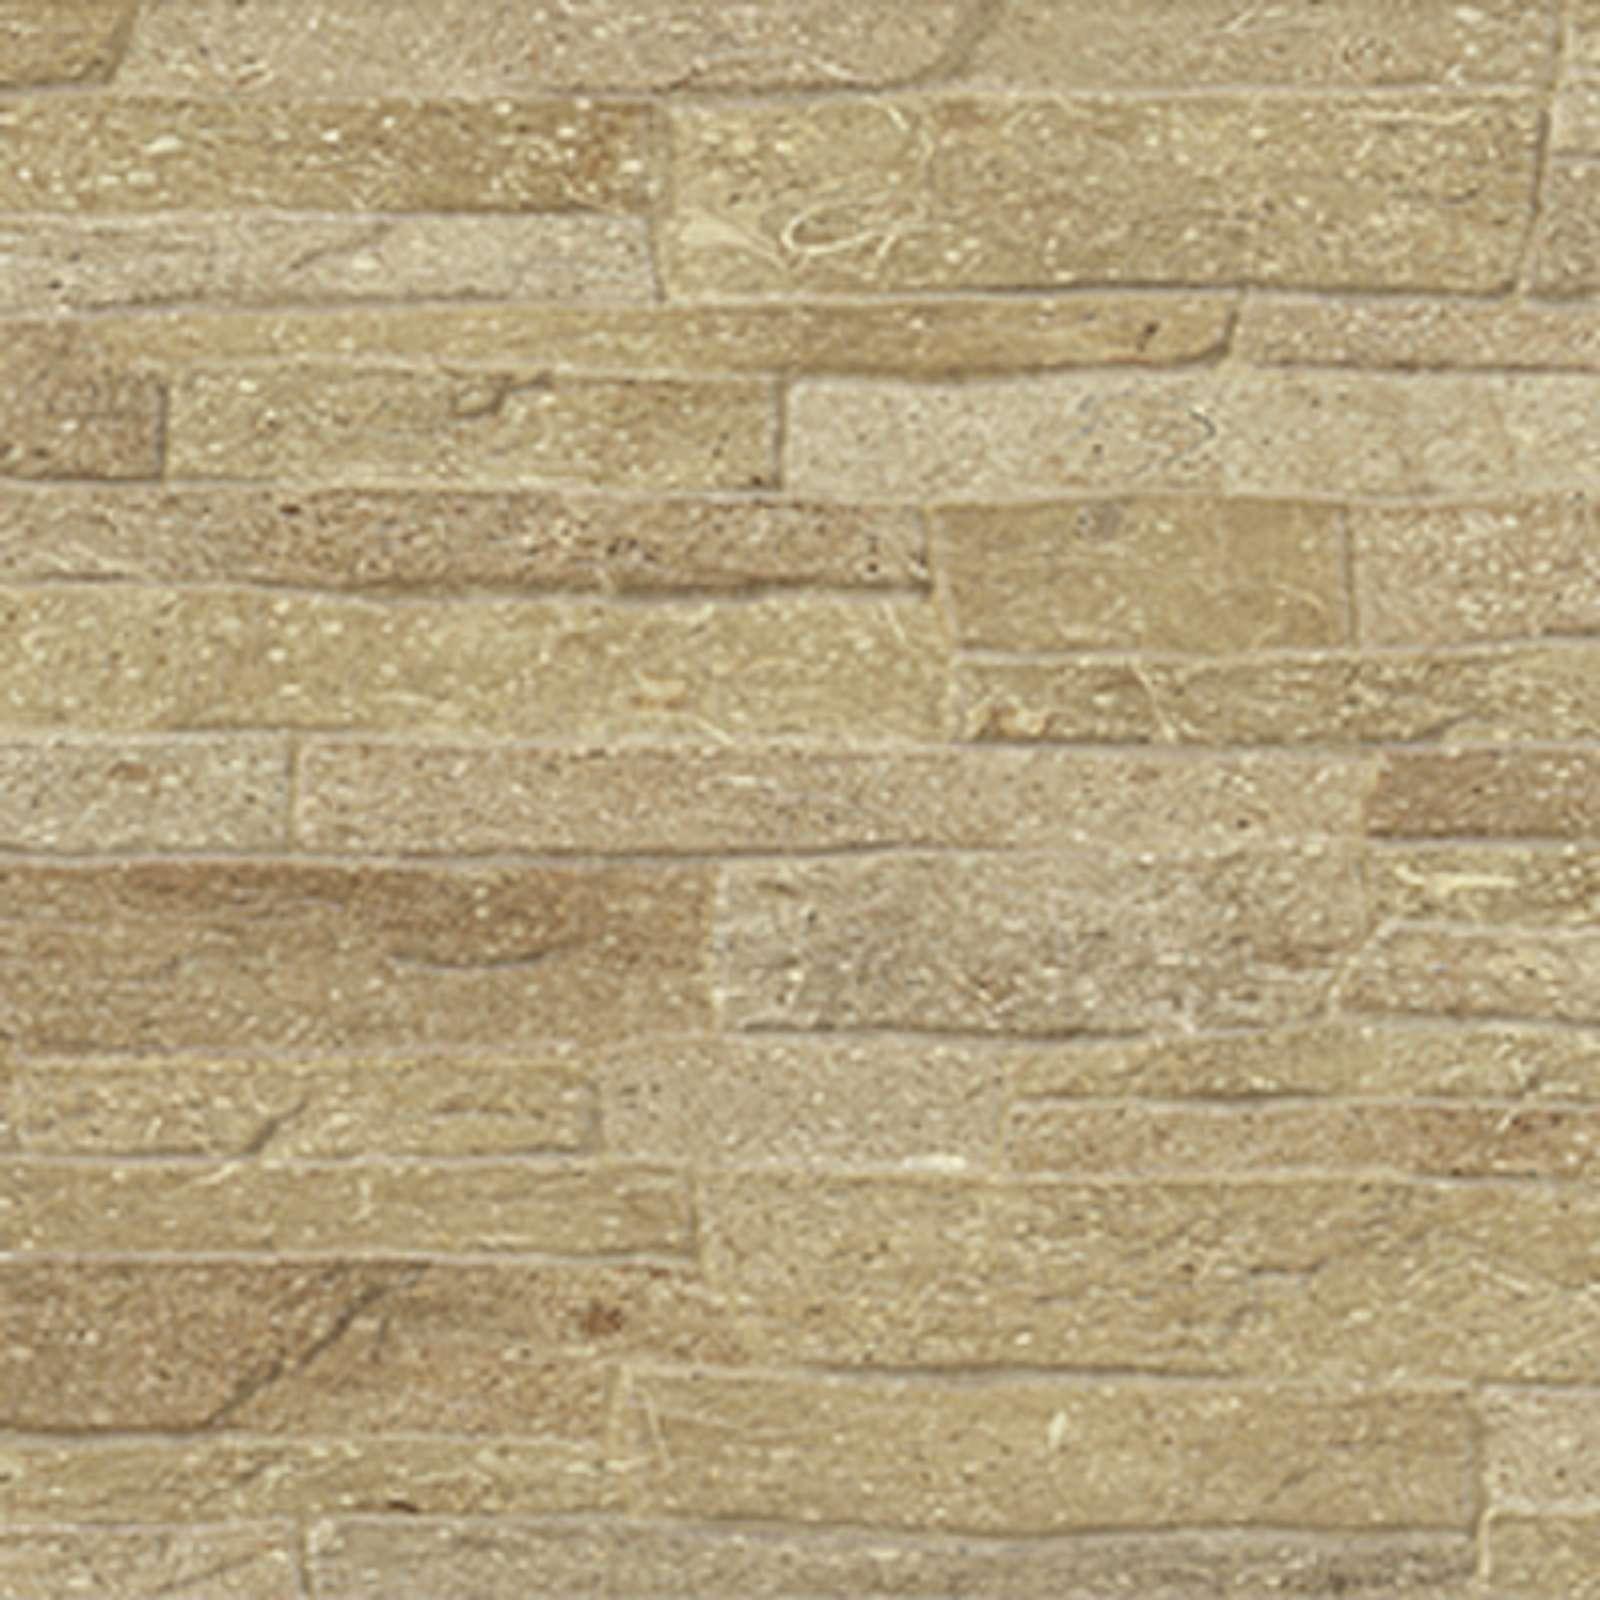 Плитка для пола 200х400мм Bastion beige PG 01, Gracia Ceramica